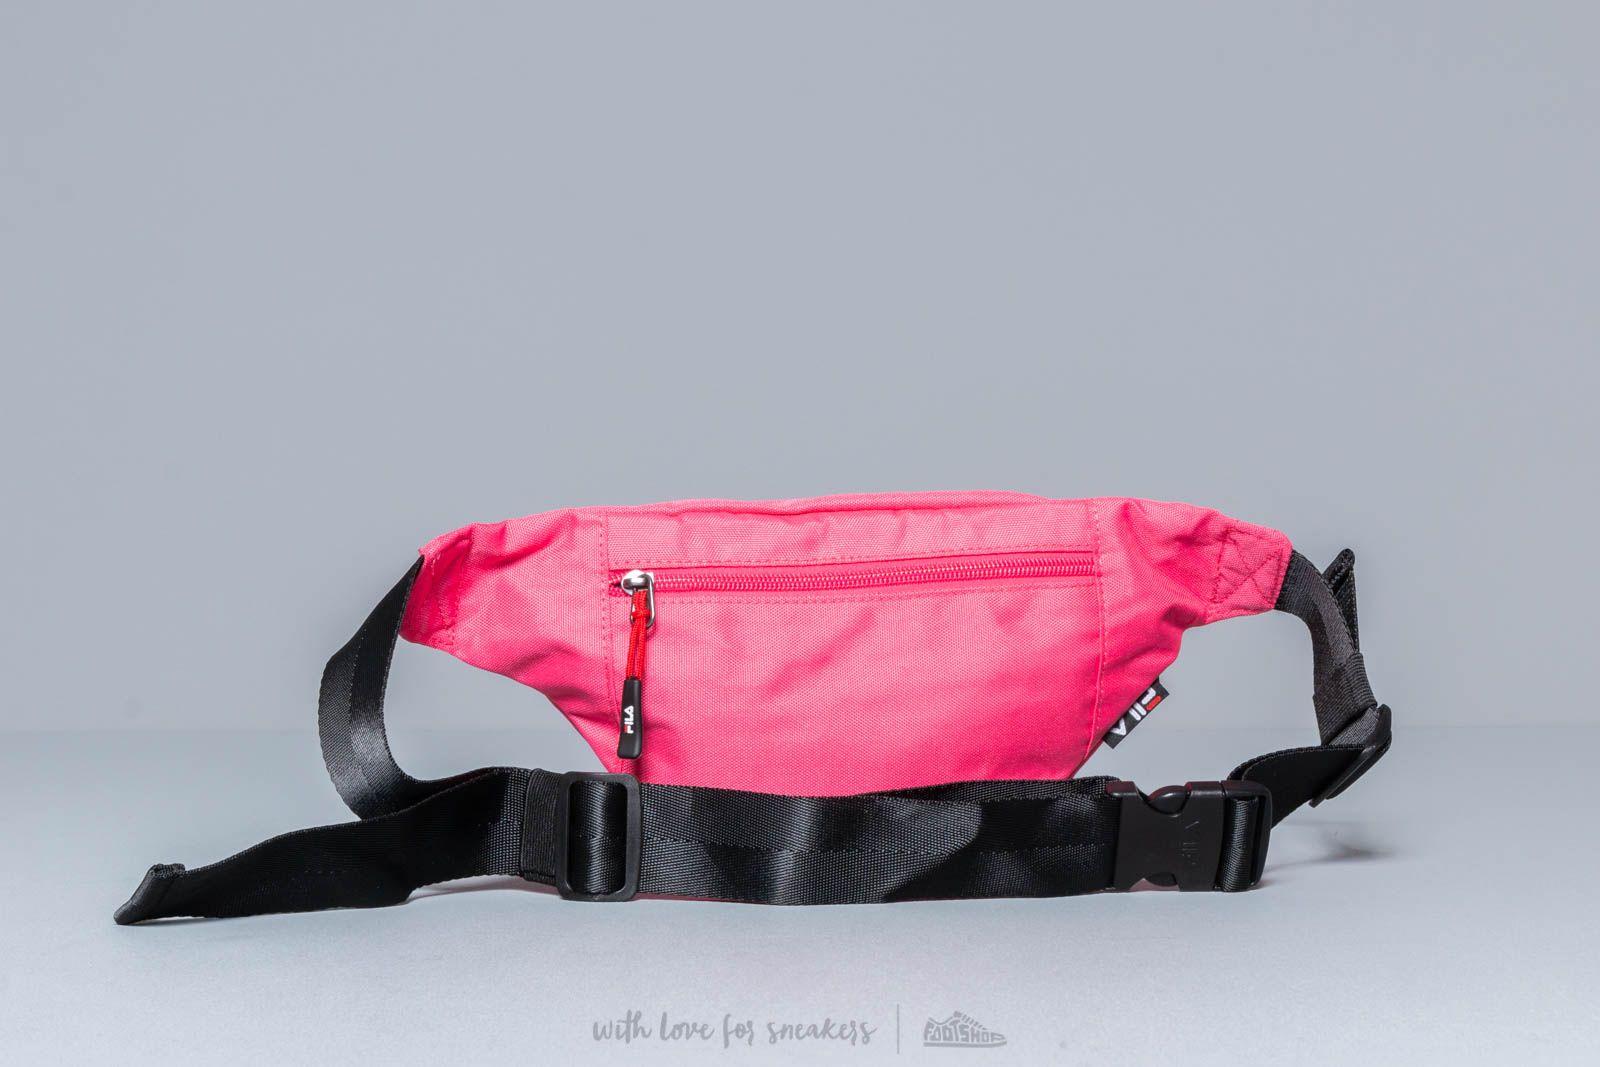 2237bc5d1f FILA Slim Waist Bag Honeysuckle at a great price 18 € buy at Footshop